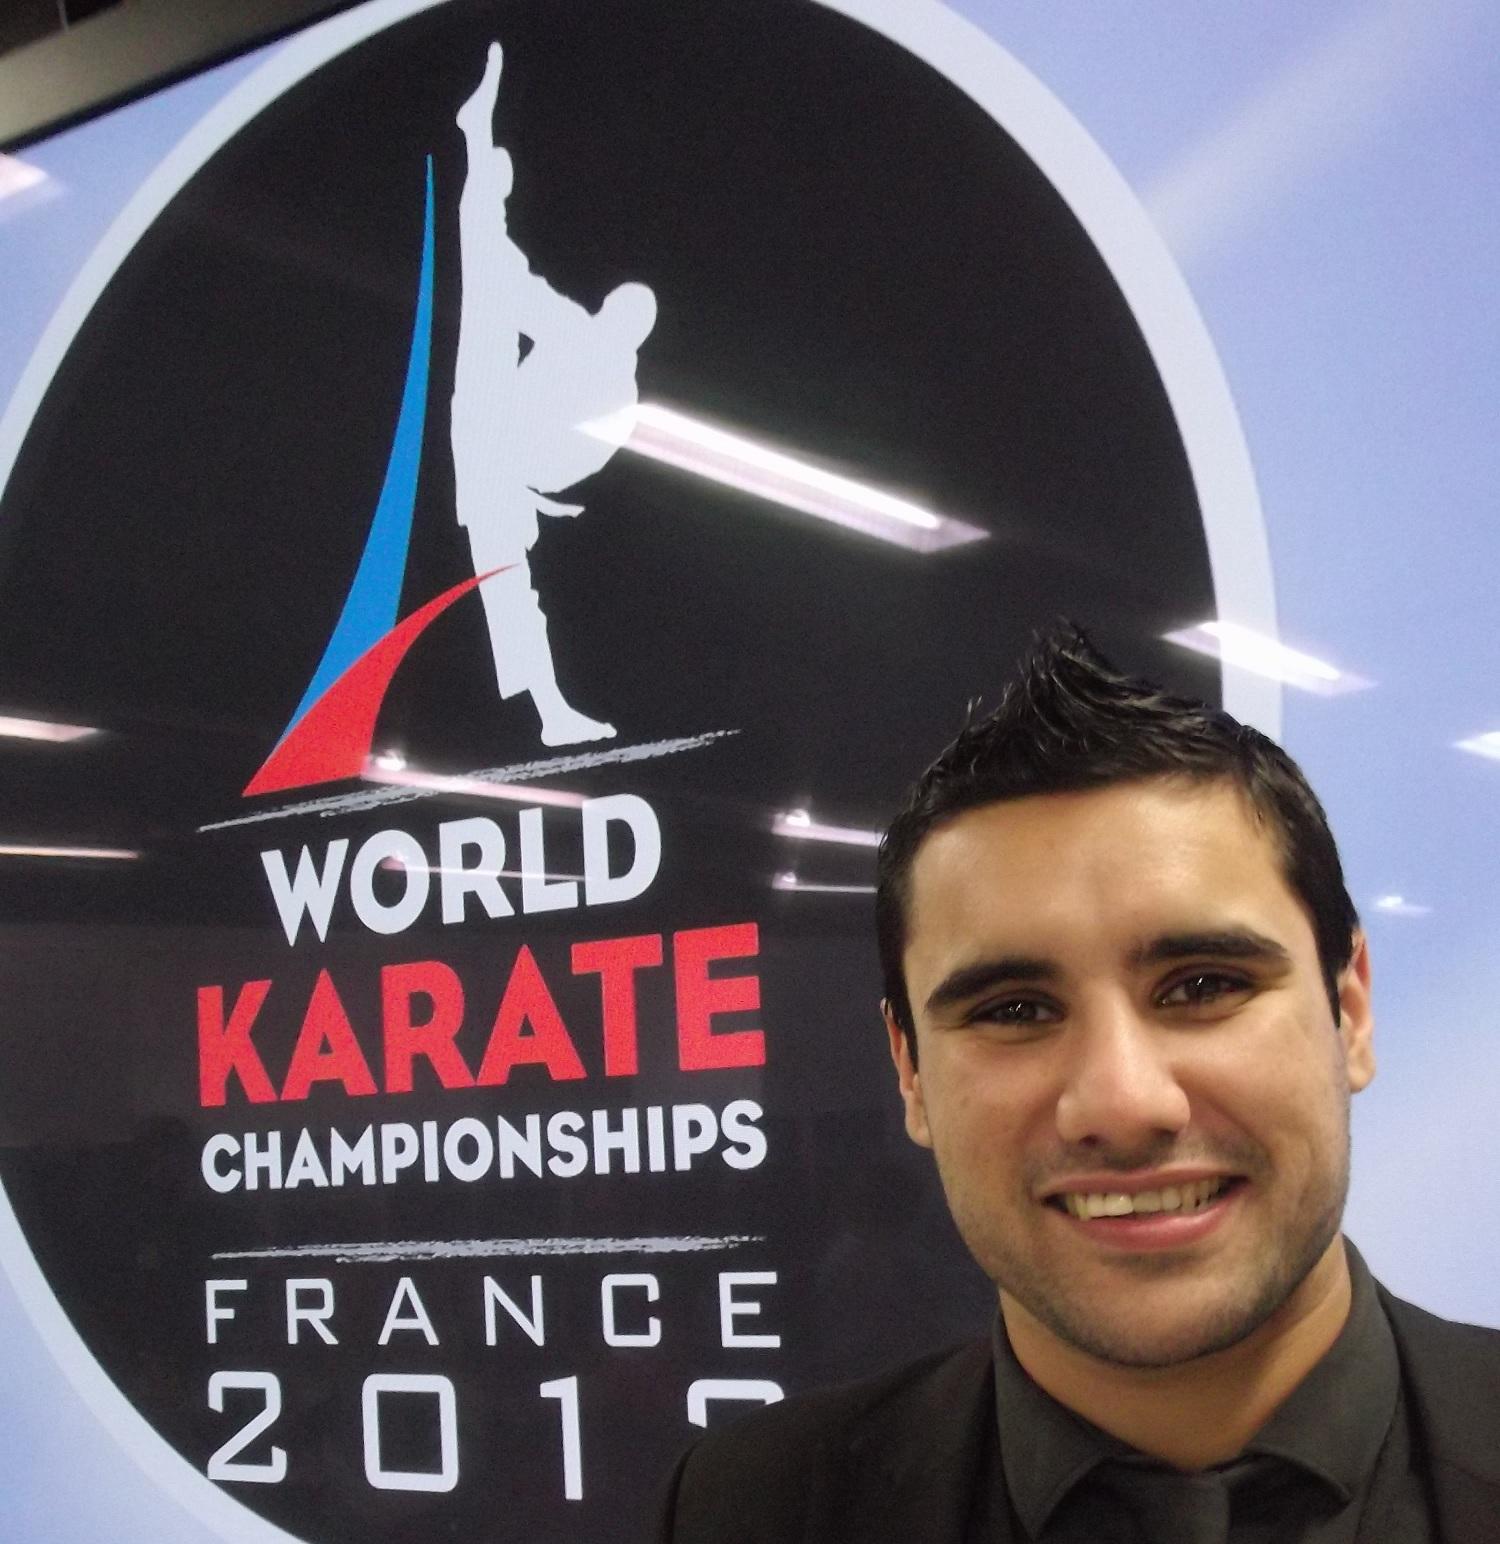 Tom Degun at World Karate Championships Paris November 25 2012